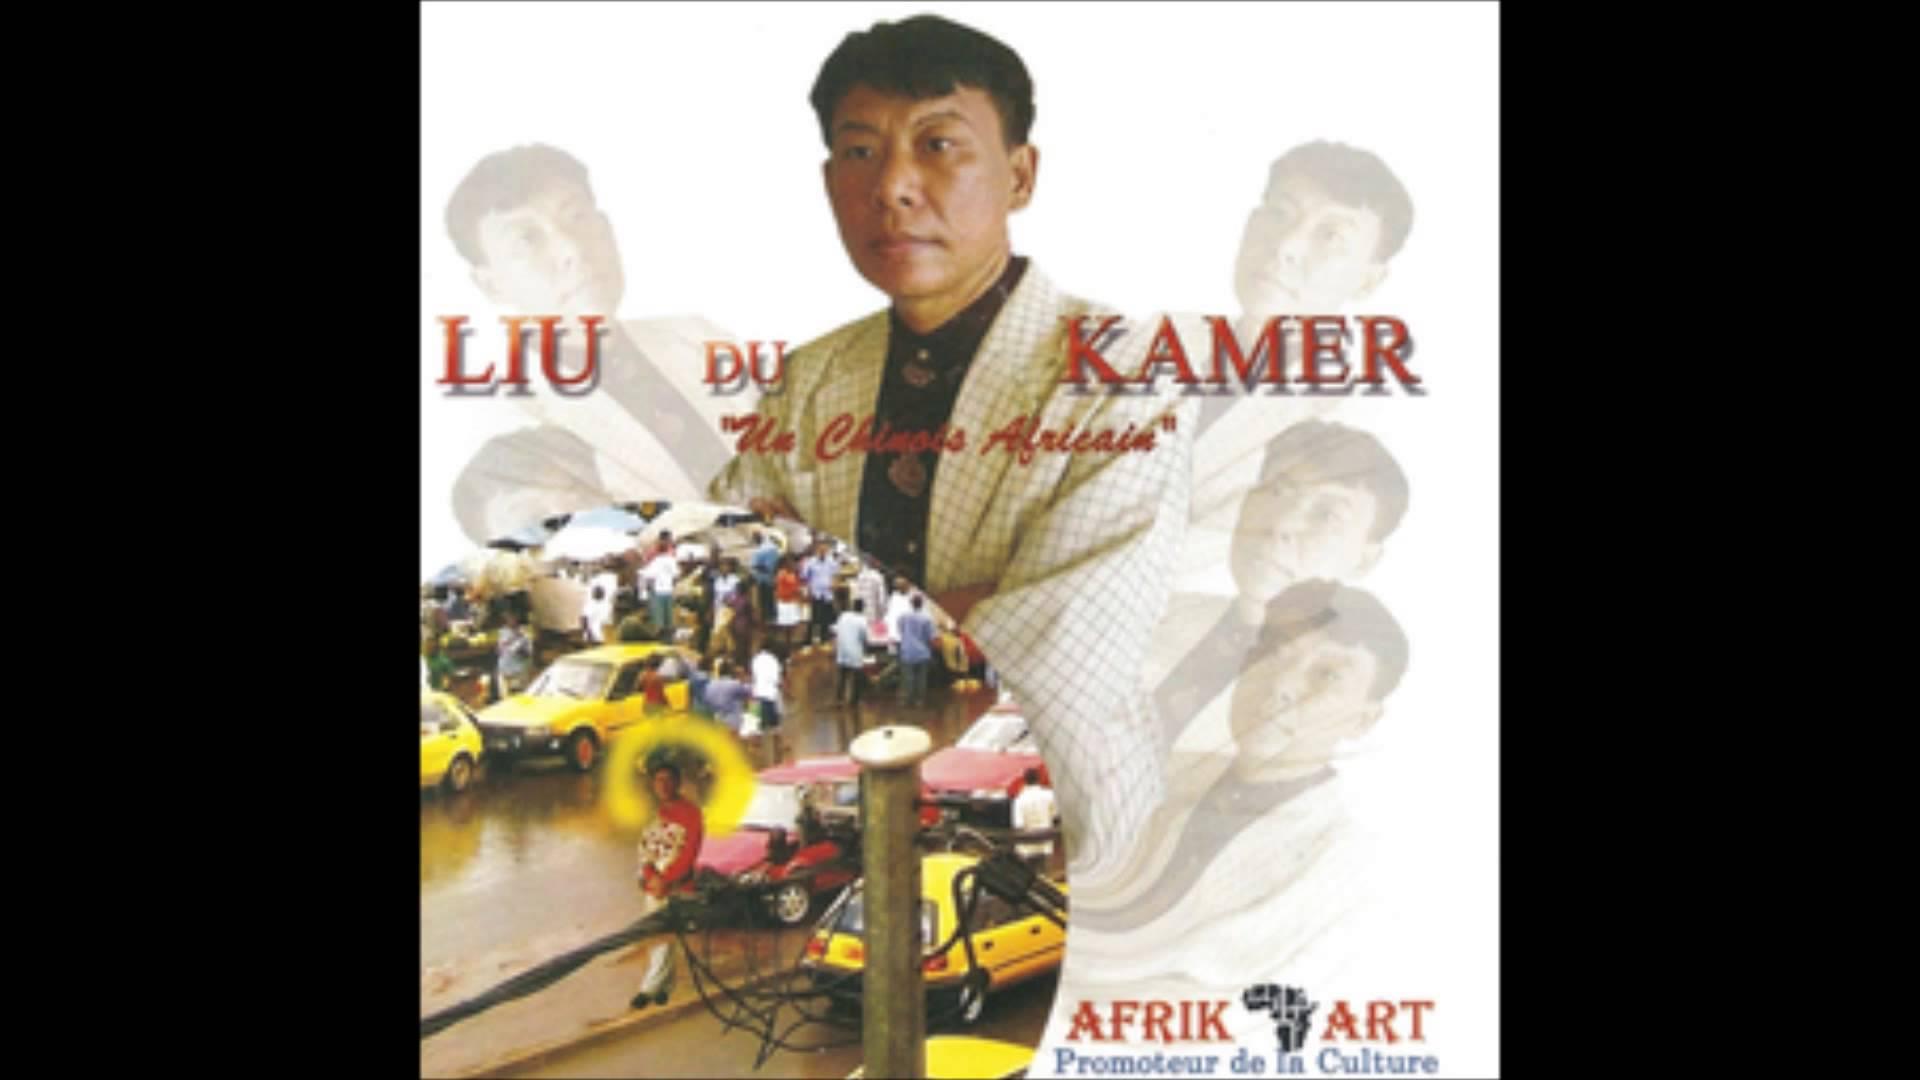 Liu-Du-Kamer